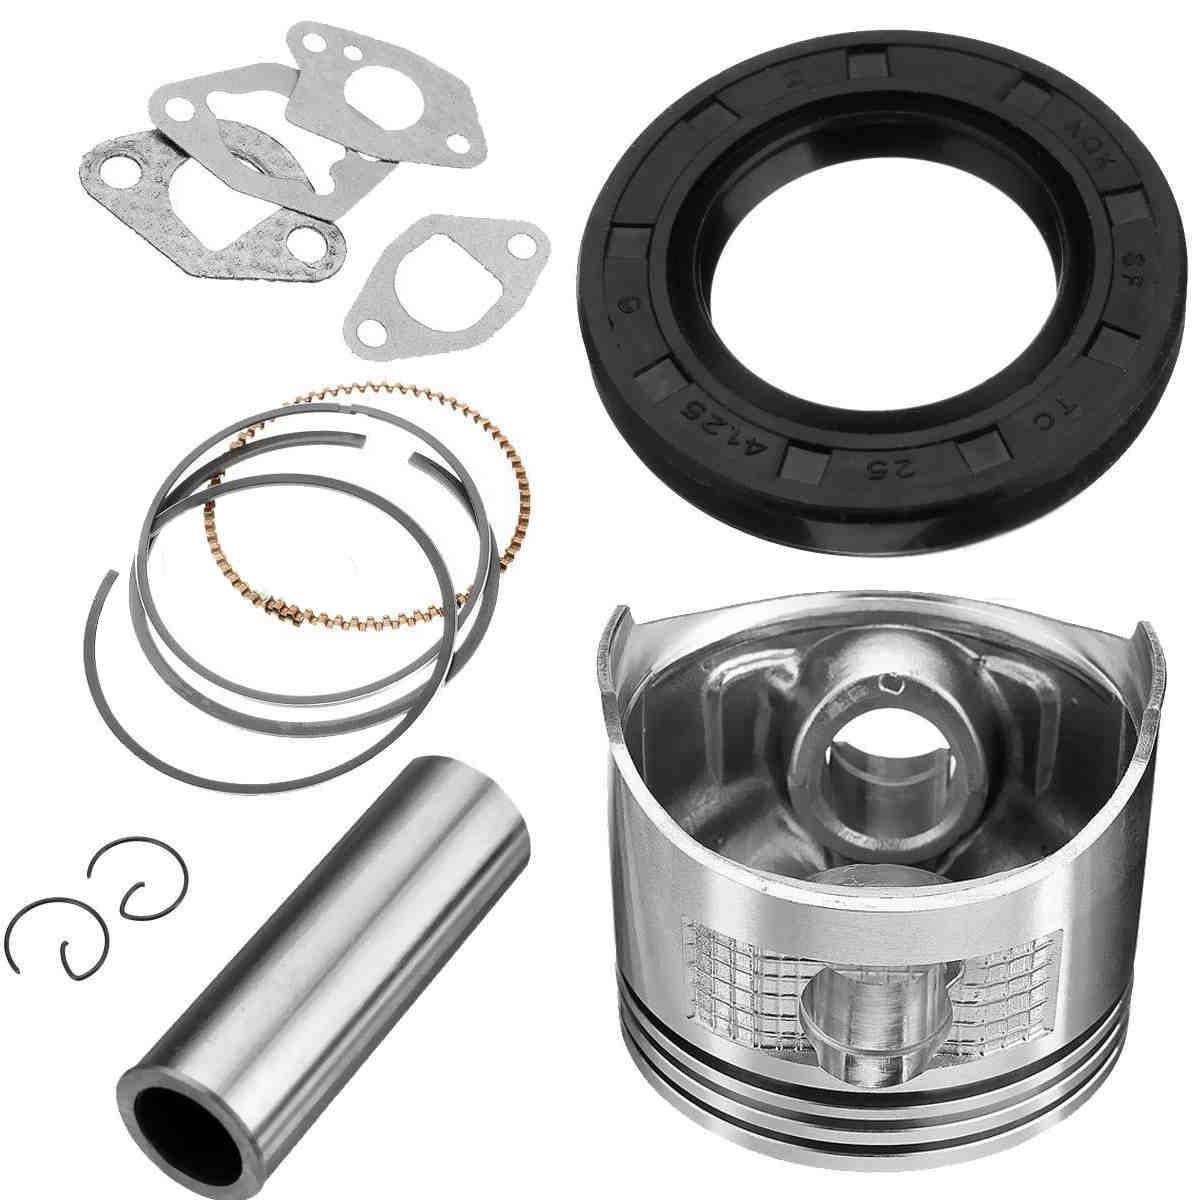 DWZ Rebuild Kit Set w/ Piston Ring + Gasket For GX160 GX200 5.5 6.5HP Engine NewDWZ Rebuild Kit Set w/ Piston Ring + Gasket For GX160 GX200 5.5 6.5HP Engine New